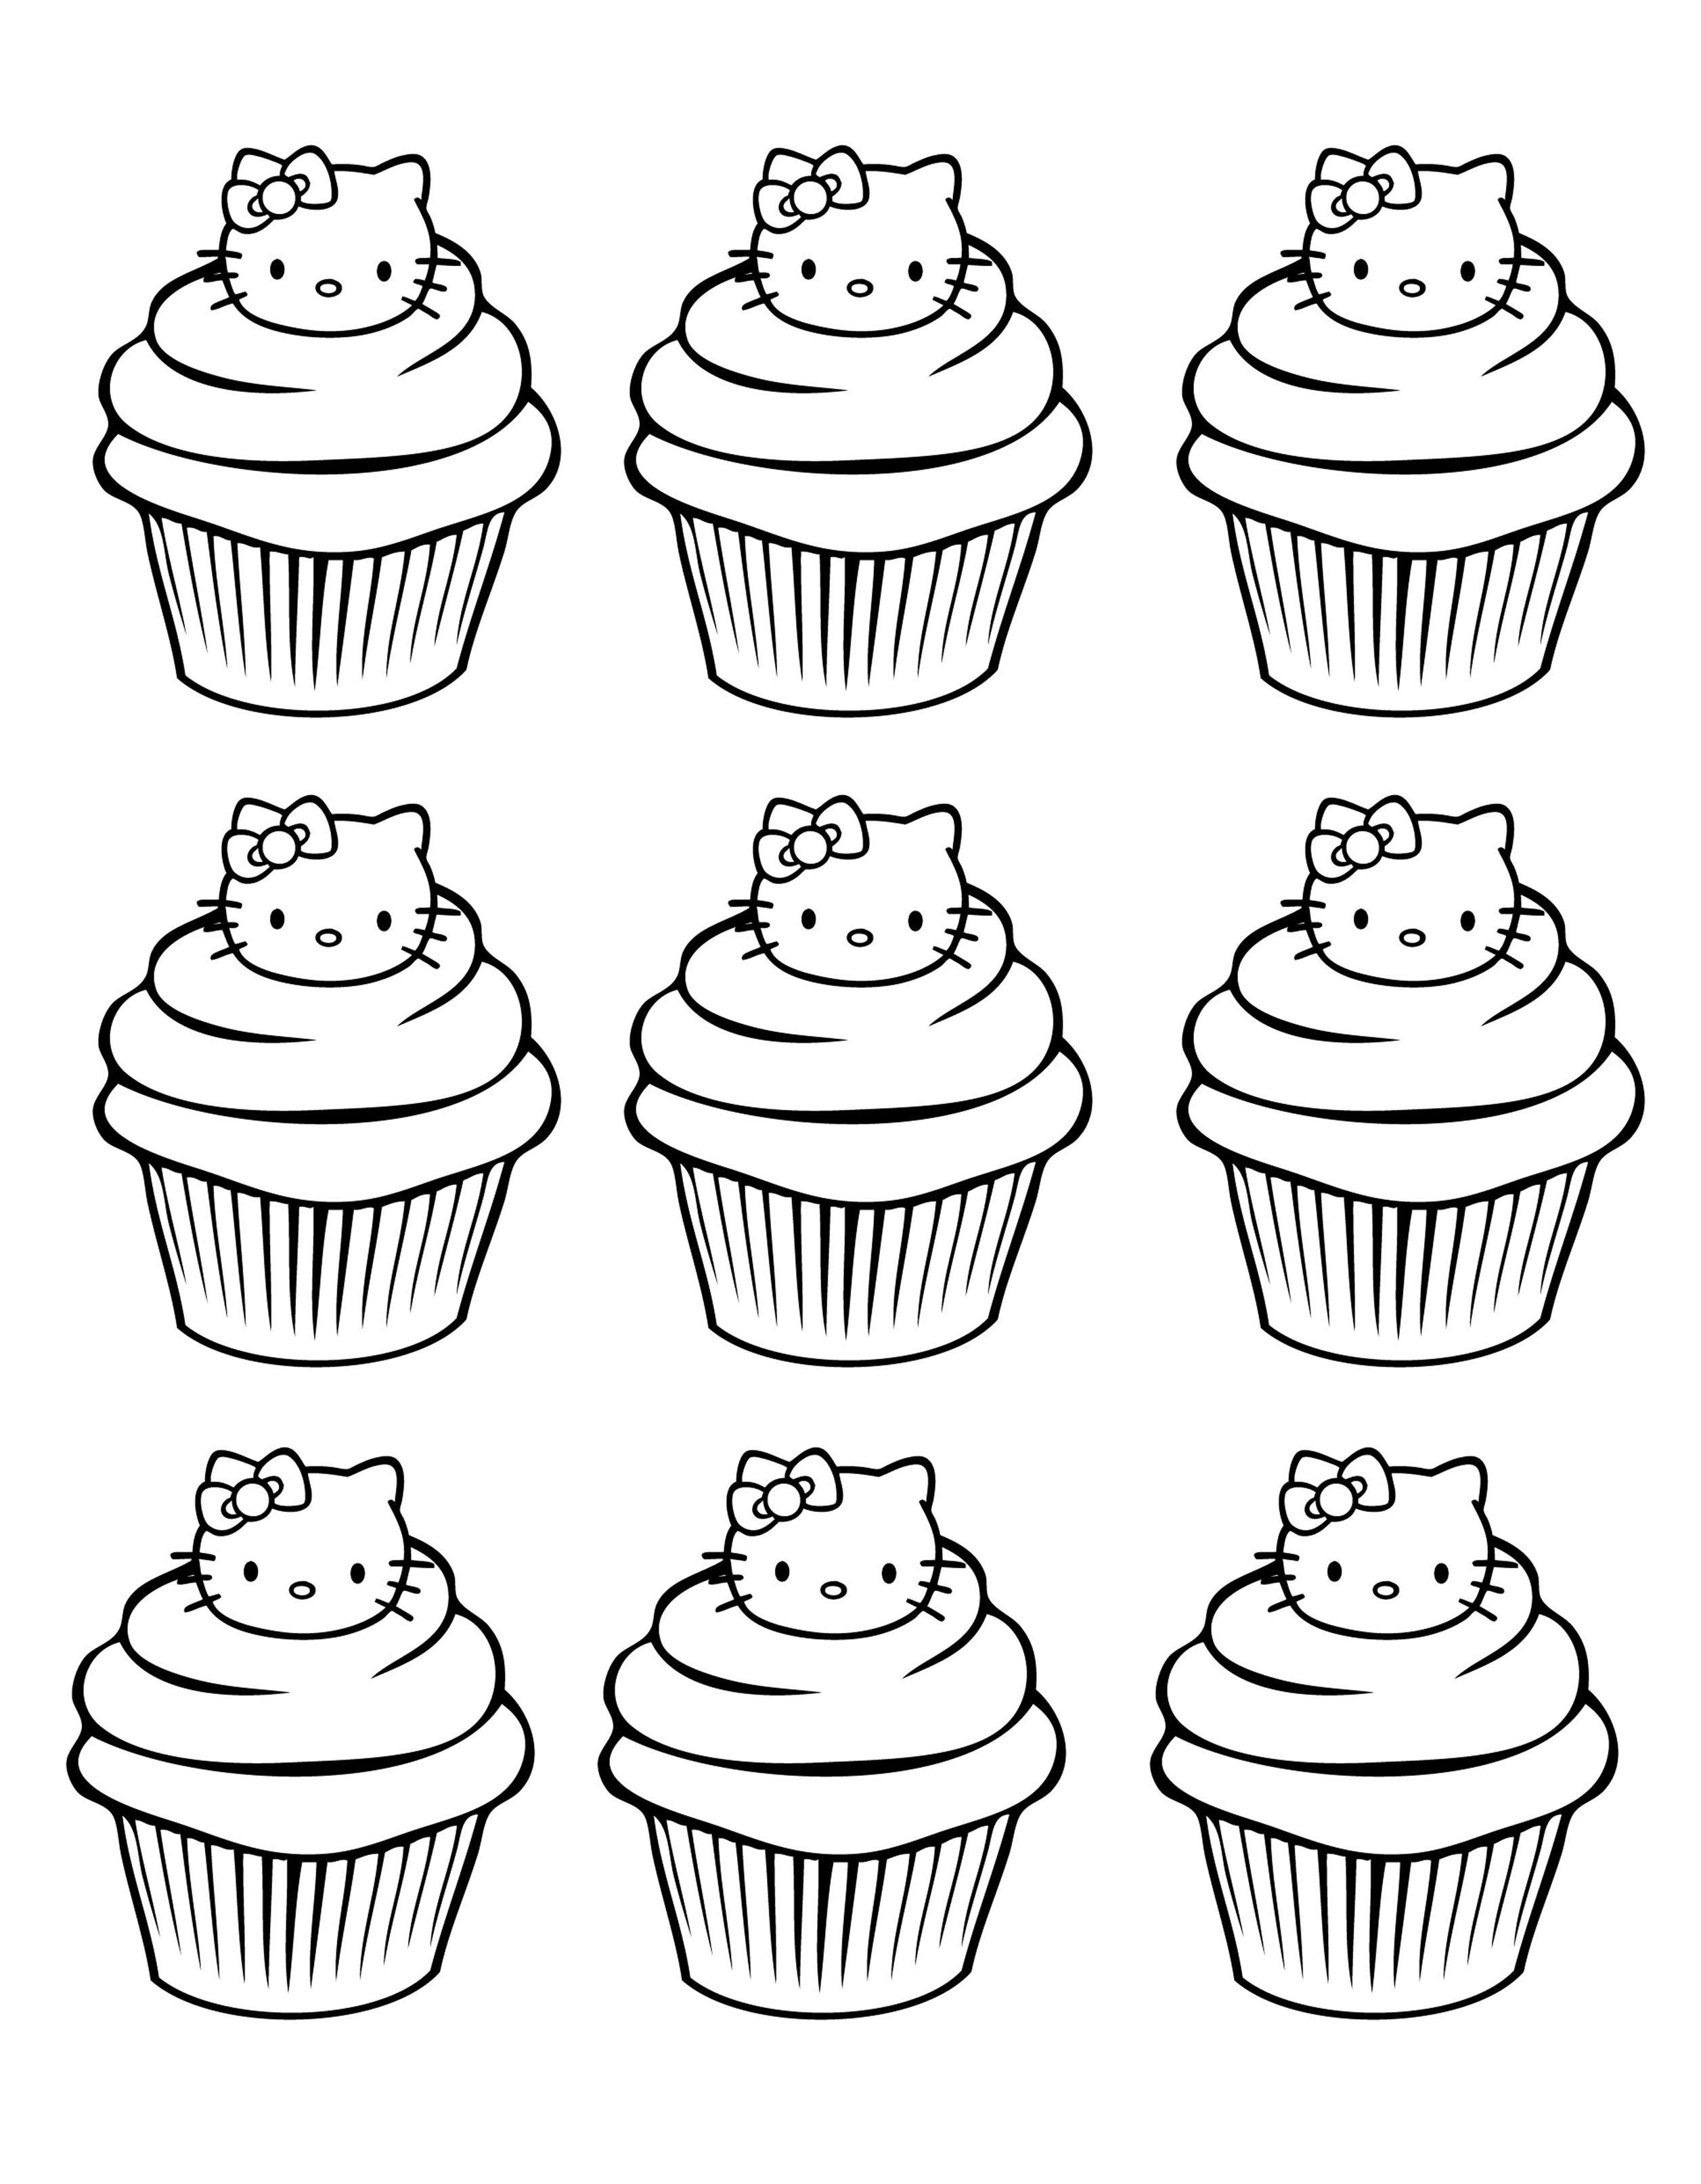 Cup cakes 56528 - Cup Cakes - Colorear para Adultos